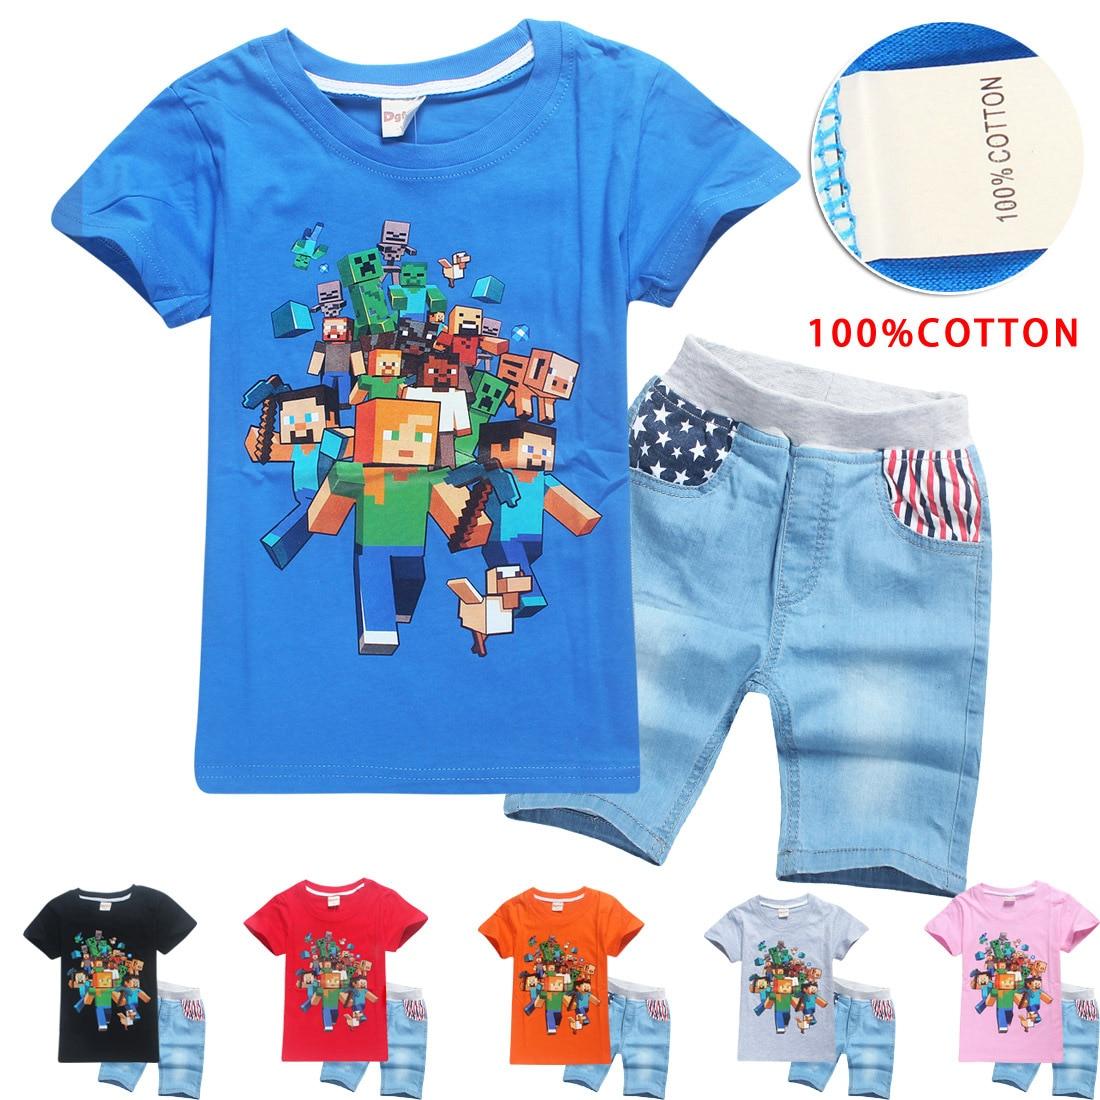 T-Shirt + Shorts Children's Sets MineCraft Kids Clothing Sets T Shirt Short Boys Kids Sports Set Cotton girl dress 100% cotton t shirt nicolo tonetto t shirt